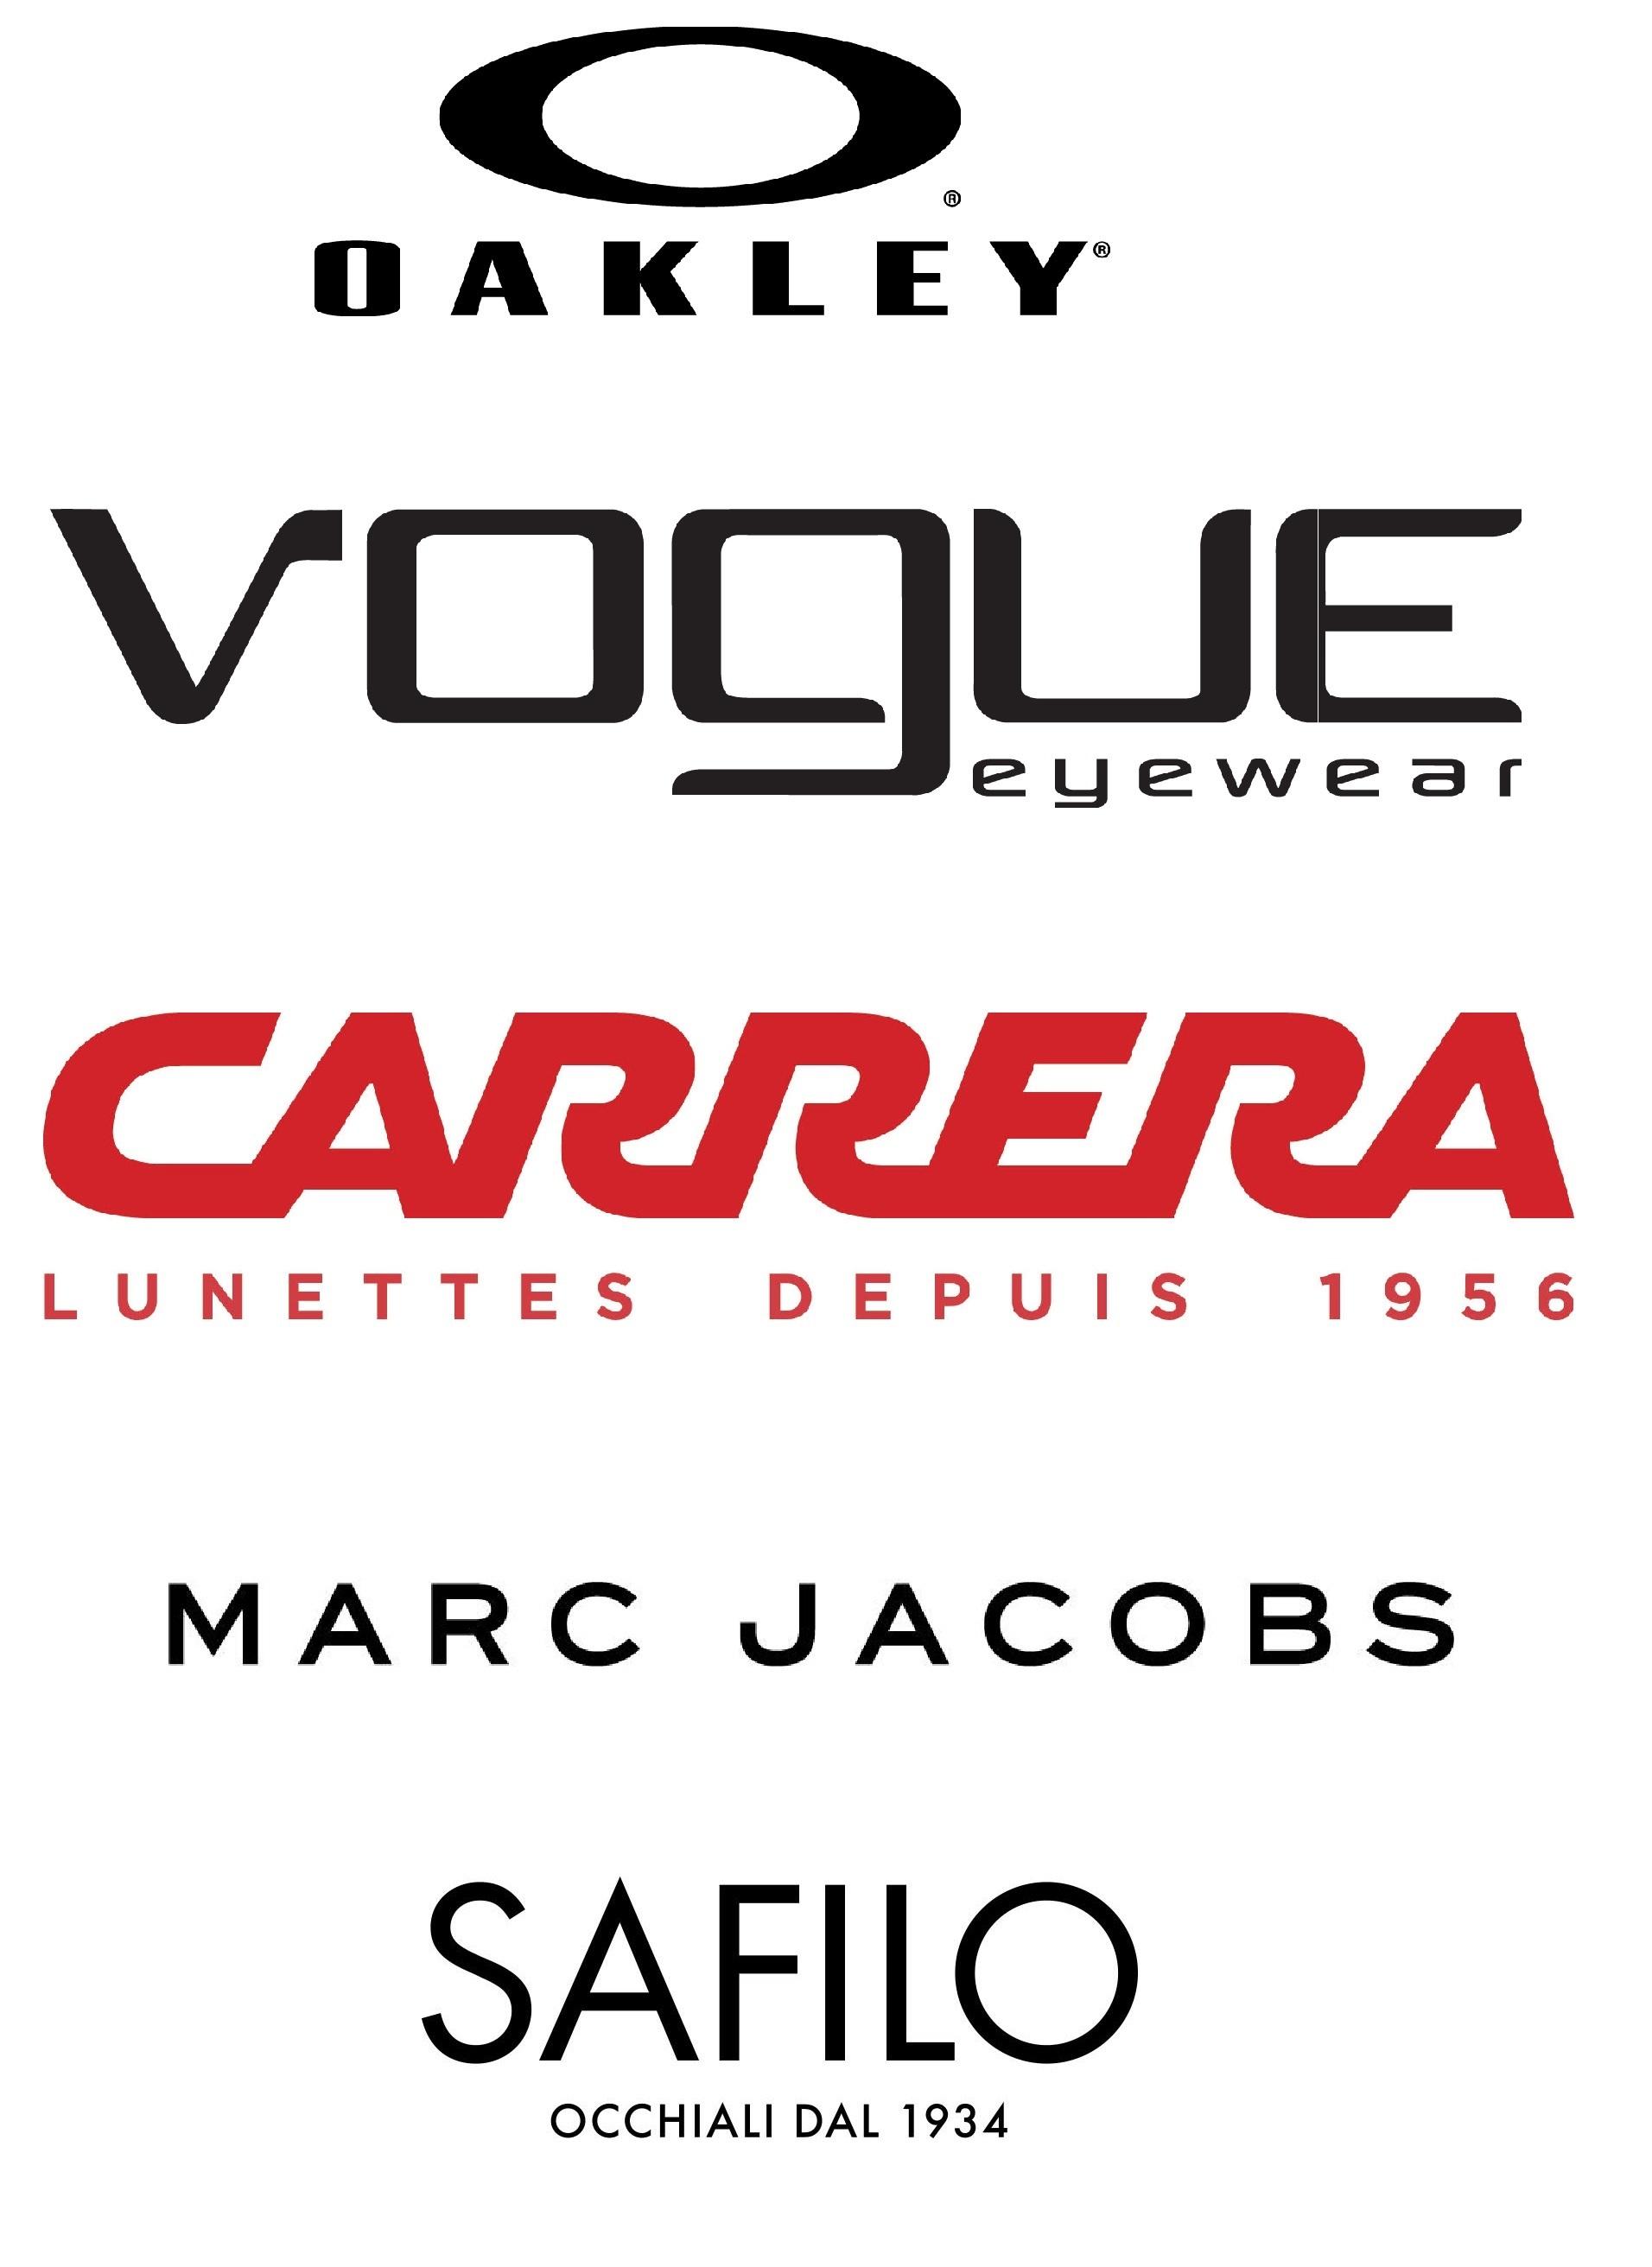 Oakley, Vogue, Carrera, Marc Jacobs, Safilo